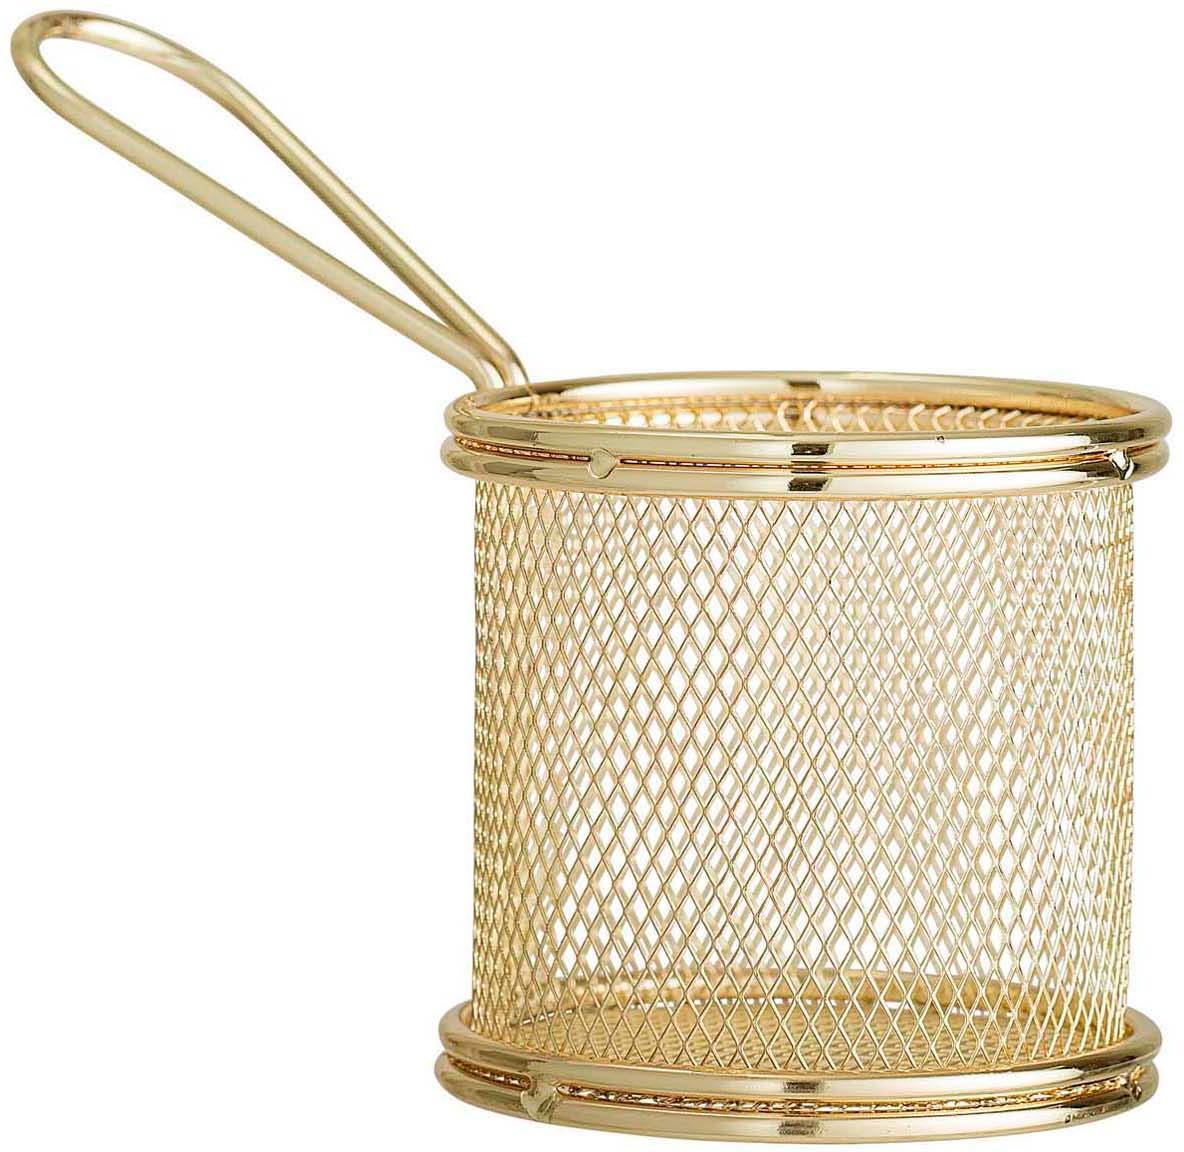 Minifreidora para servir Mingolet, Acero inoxidable, recubierto, Latón, Ø 9 x Al 9 cm